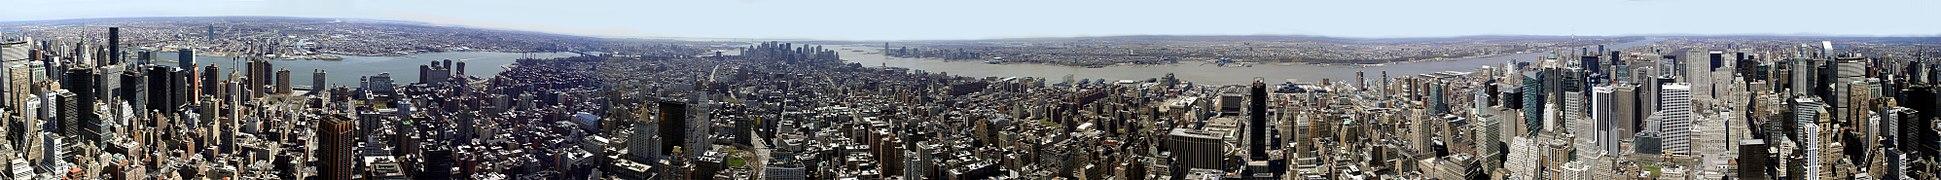 Skyline-New-York-City.jpg